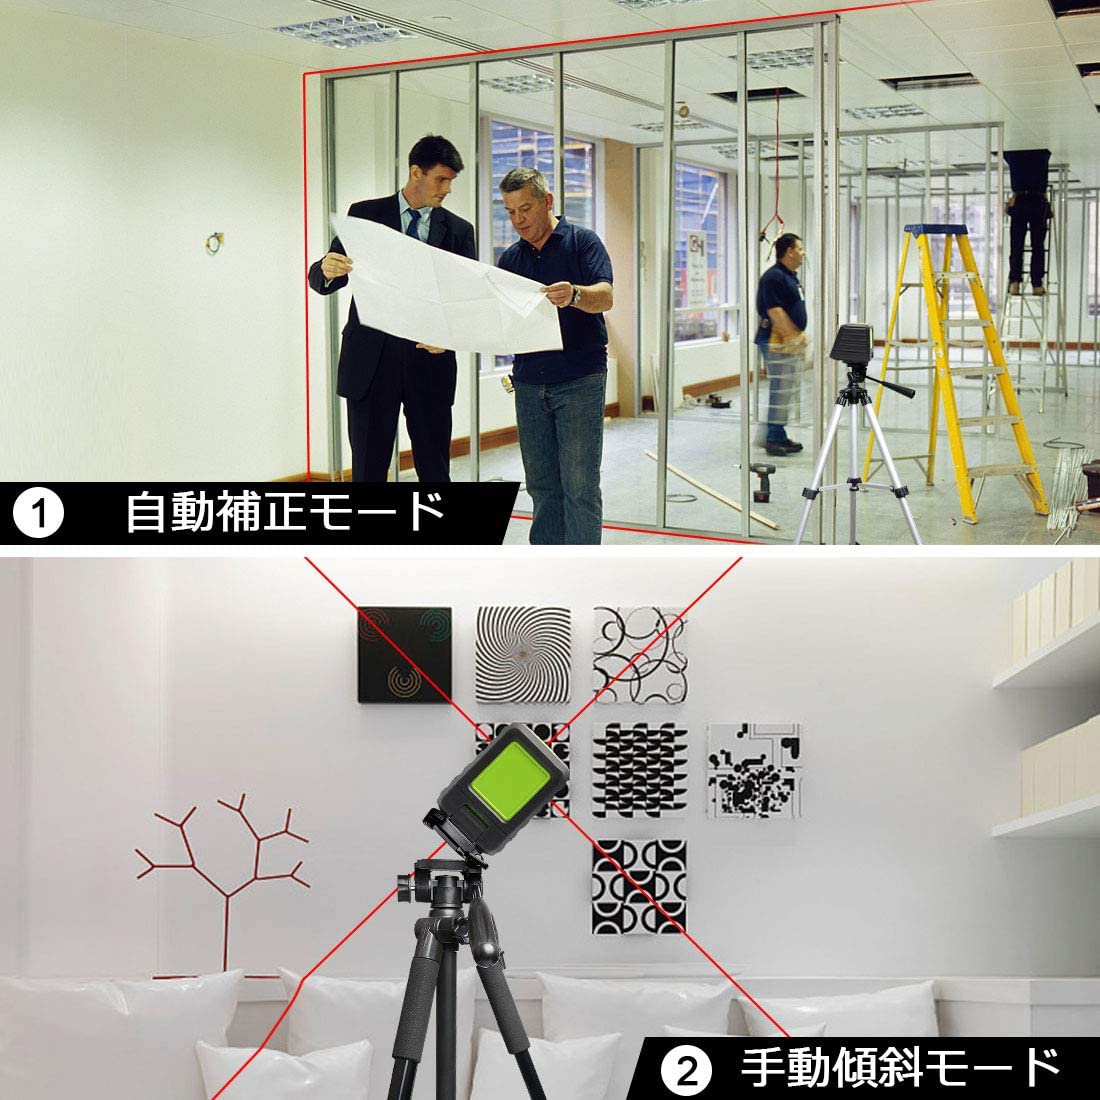 Huepar(ヒューパー) 2ライン レーザー墨出し器 M-BOX-1Rの商品画像3